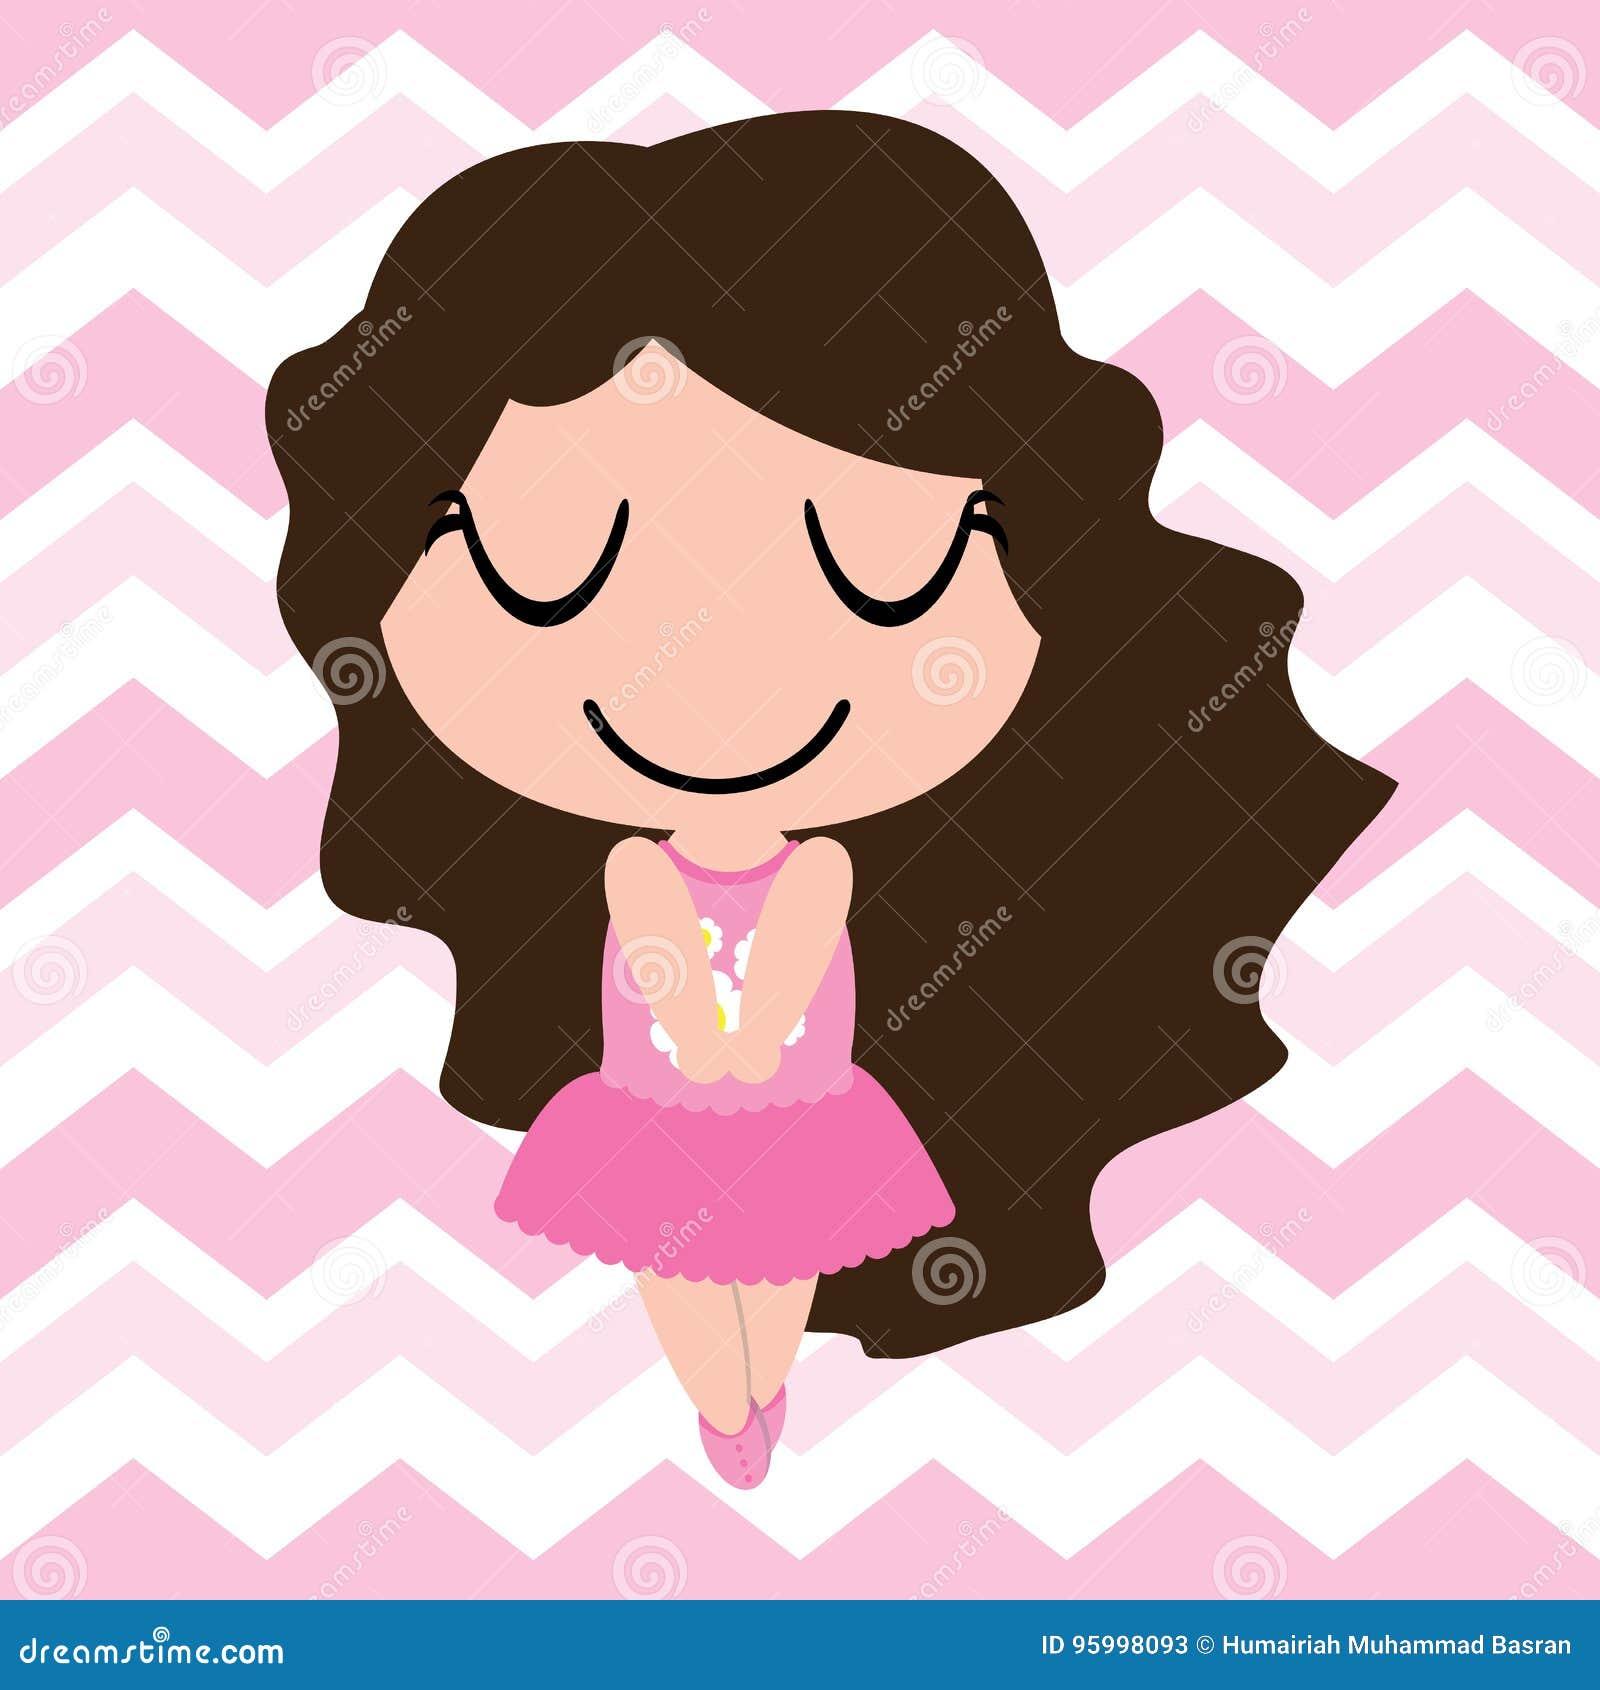 Kid Nursery Wall With Cute Girls On Pink Chevron Background Cartoon